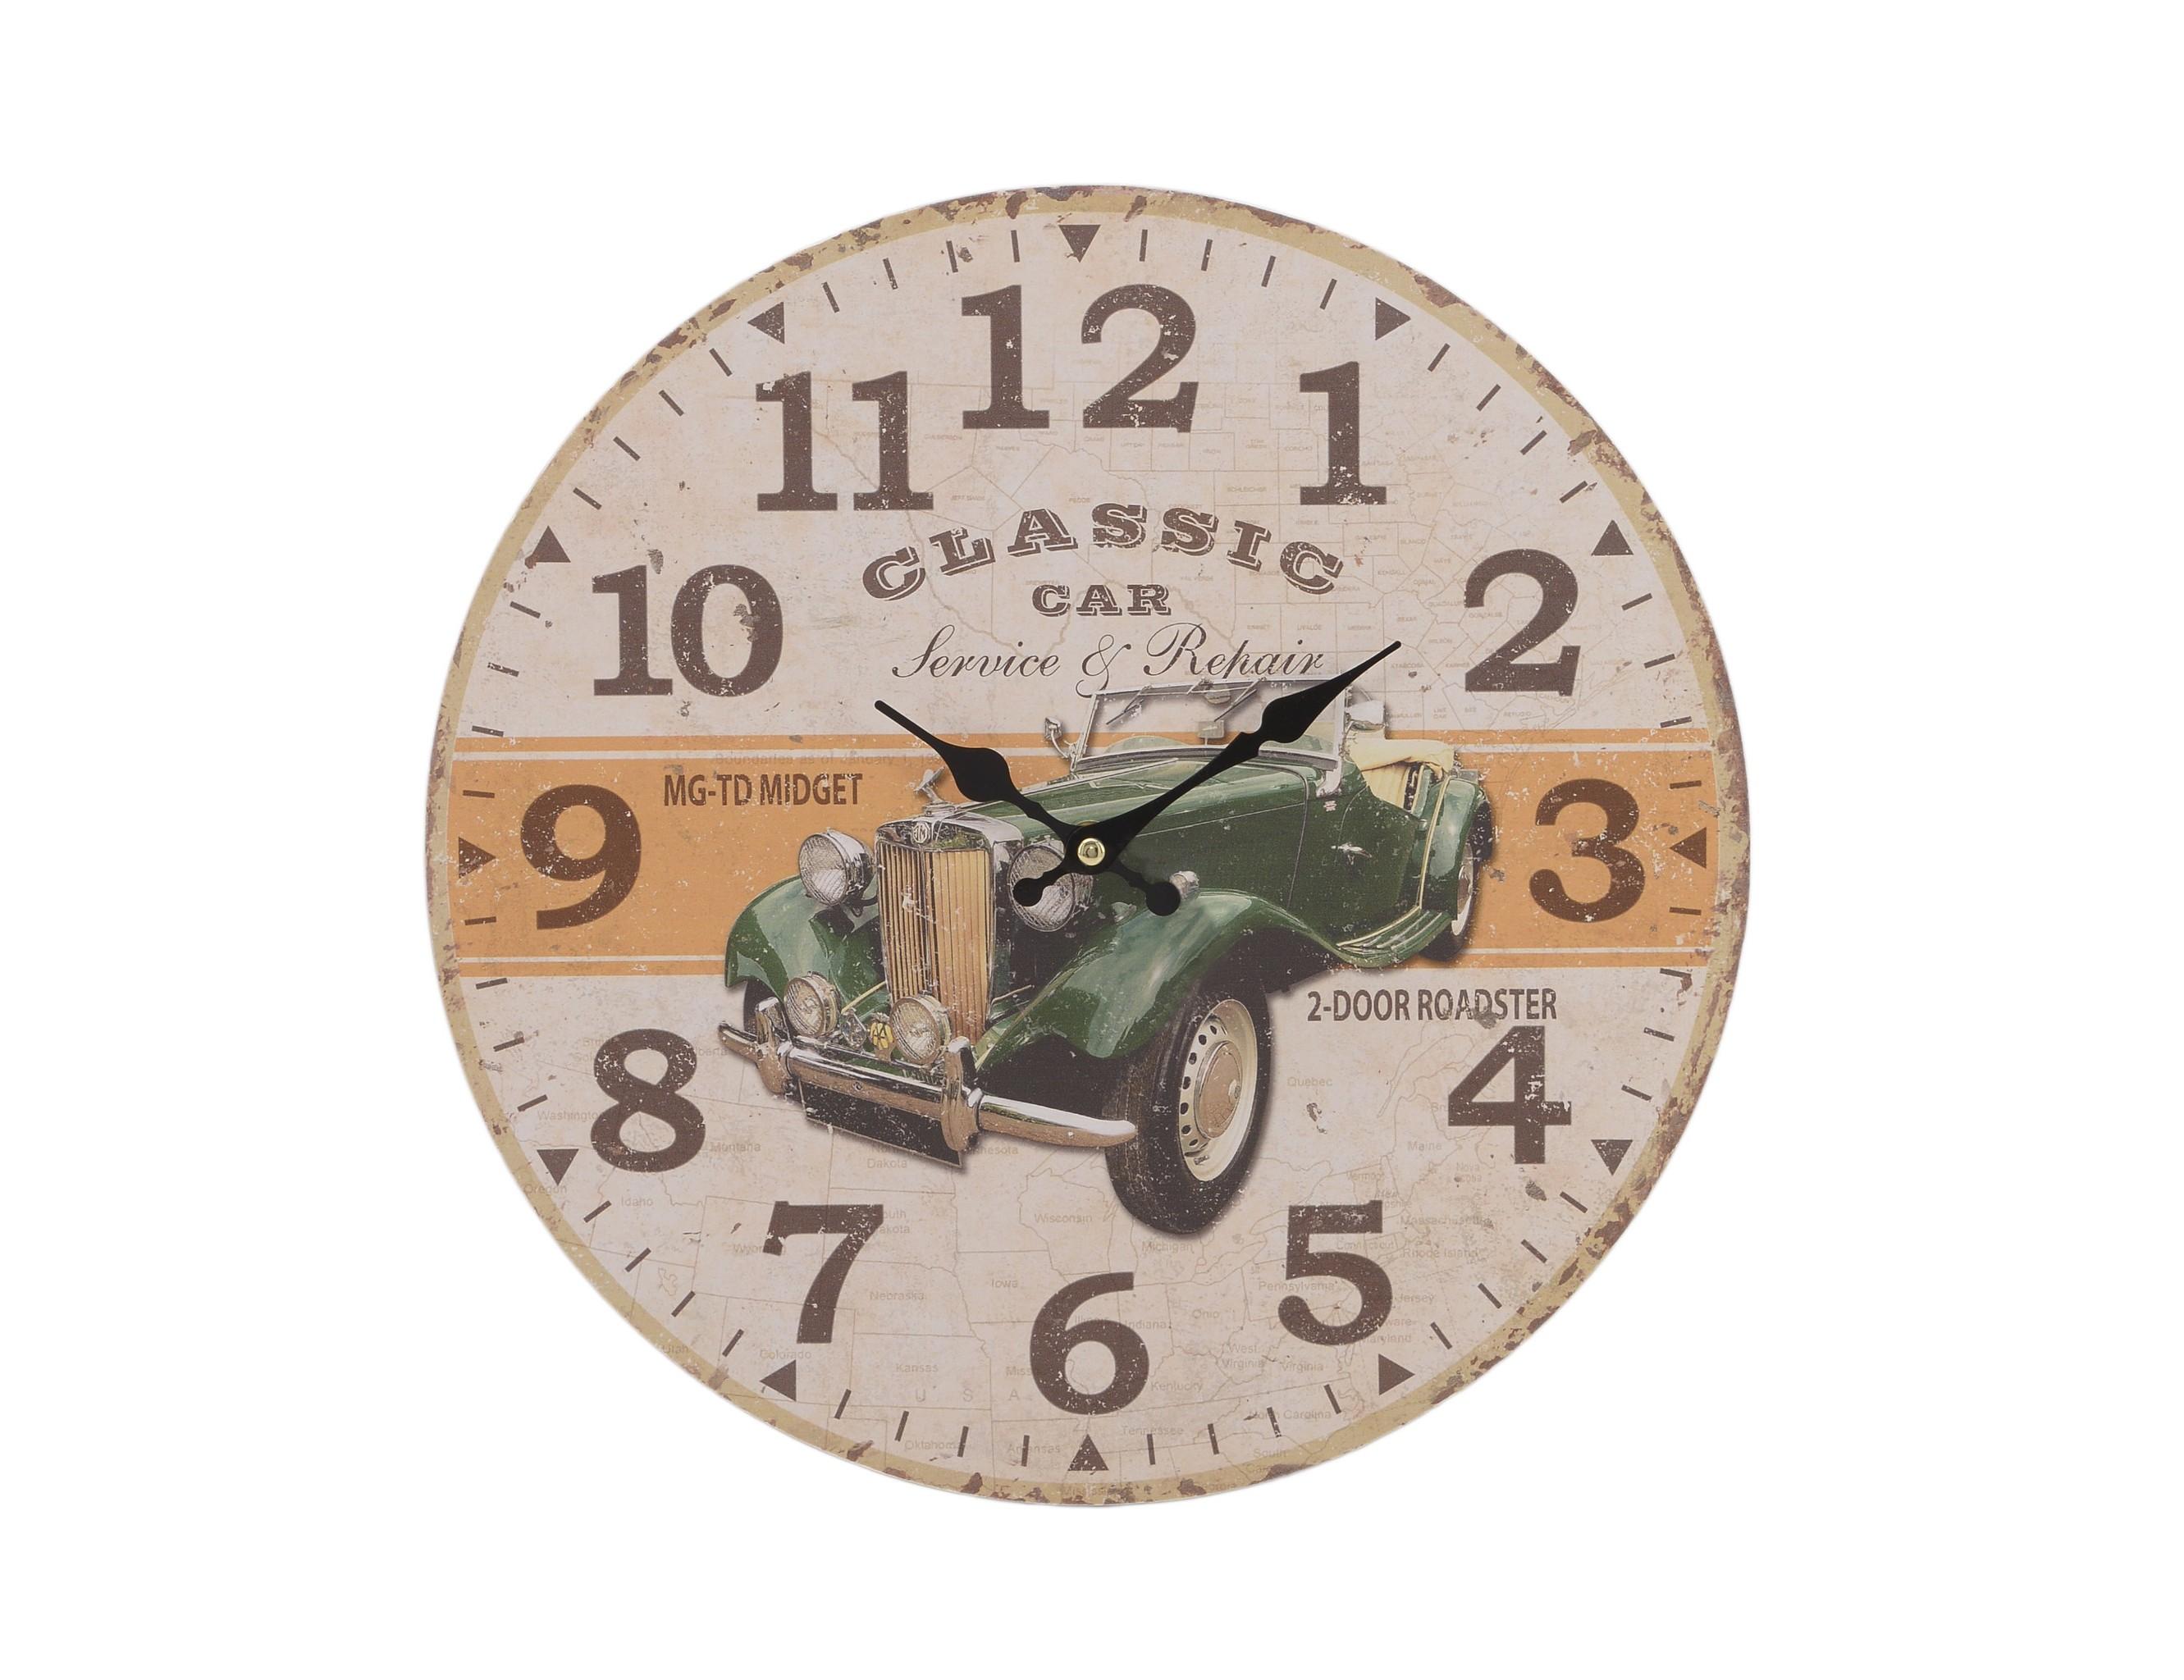 Часы настенные SpectroНастенные часы<br>Механизм: кварцевый&amp;lt;div&amp;gt;Материал: МДФ, металл&amp;lt;/div&amp;gt;<br><br>Material: Металл<br>Width см: 34<br>Depth см: 3<br>Height см: 34